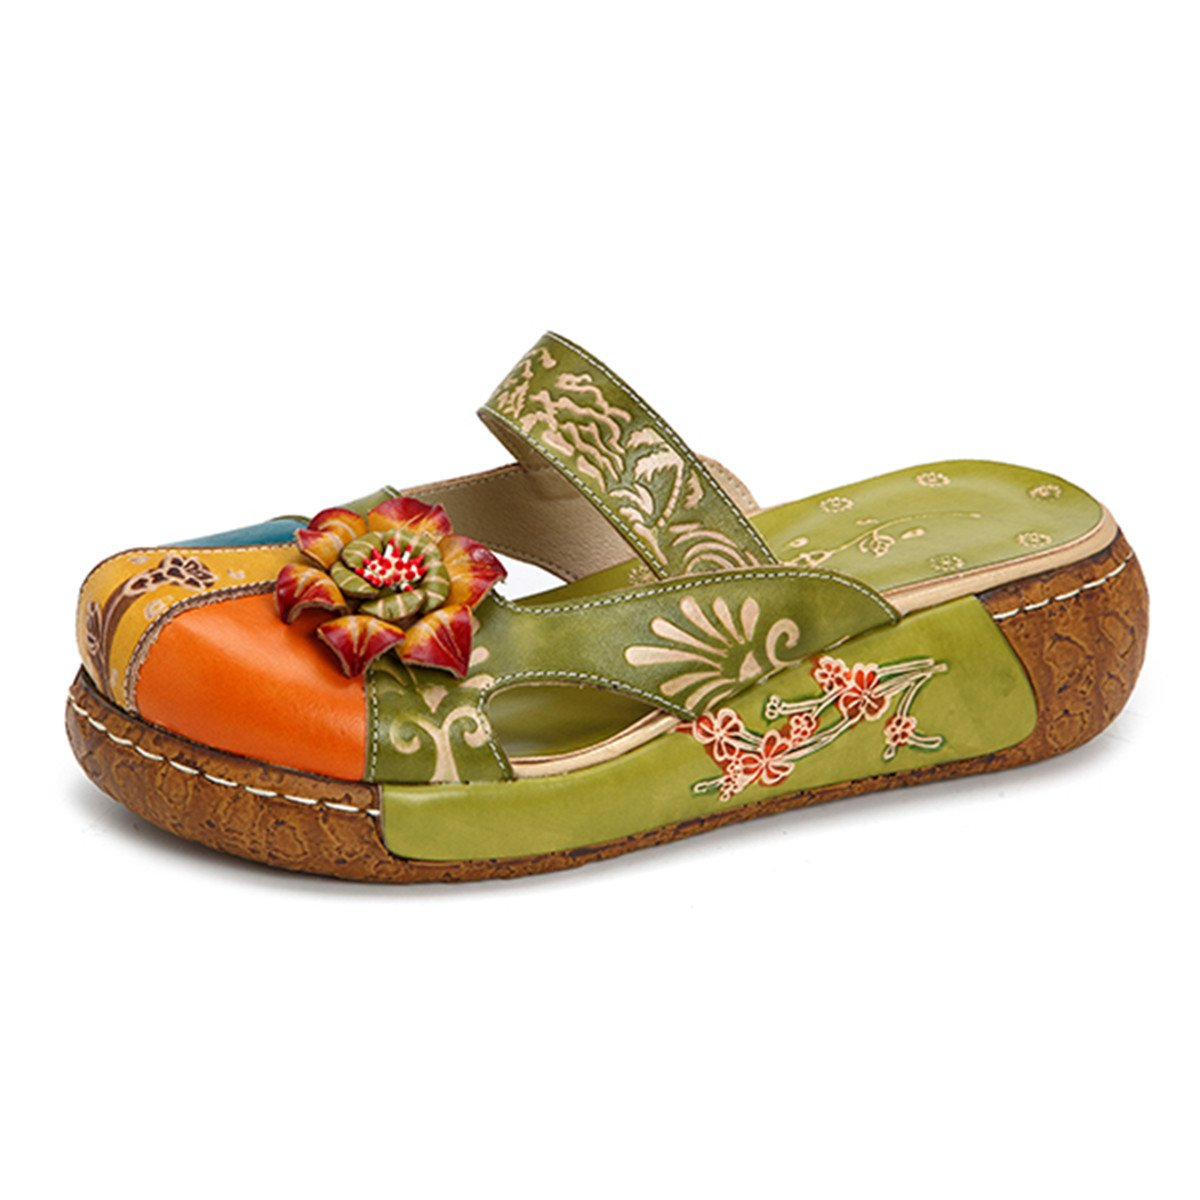 Gracosy Damen Sandalen, Sommer Leder Pantoffel Vintage Slipper Rückenfrei Clogs Bunte Blume Schuhe Weich Komfortabel  40 EU|Grün